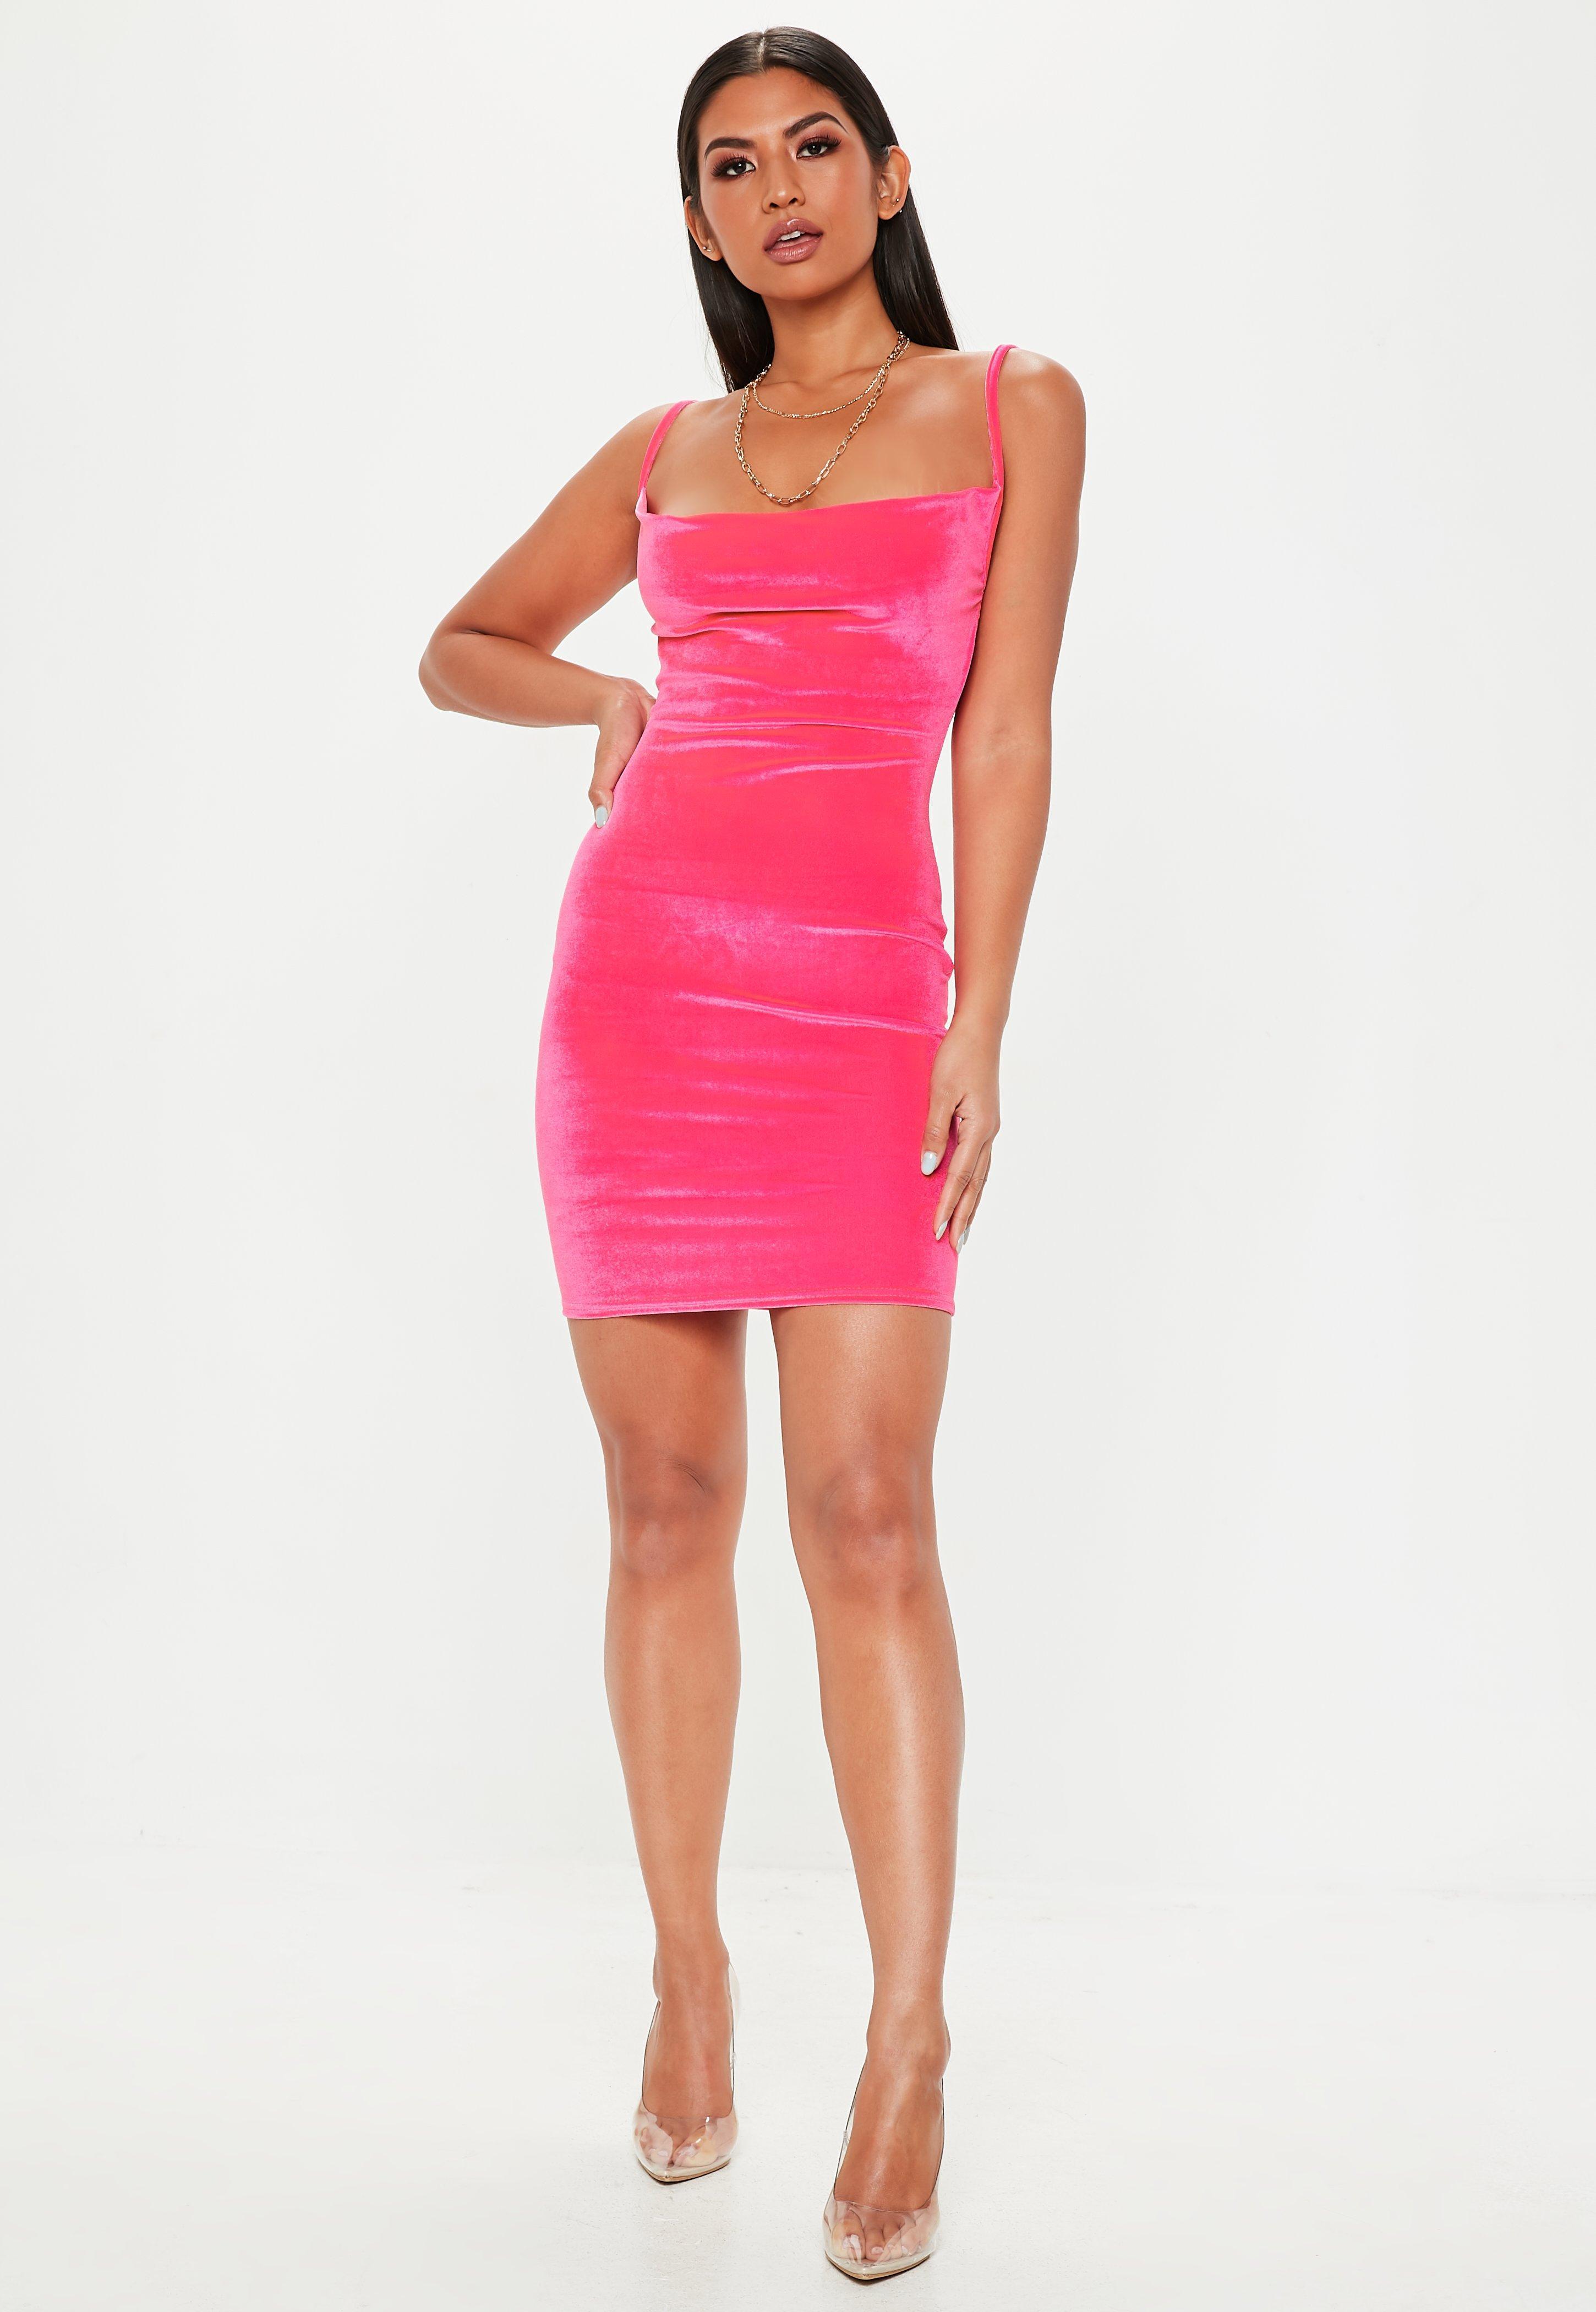 29f025e1c041 Missguided Pink Neon Velvet Cowl Mini Dress in Pink - Lyst